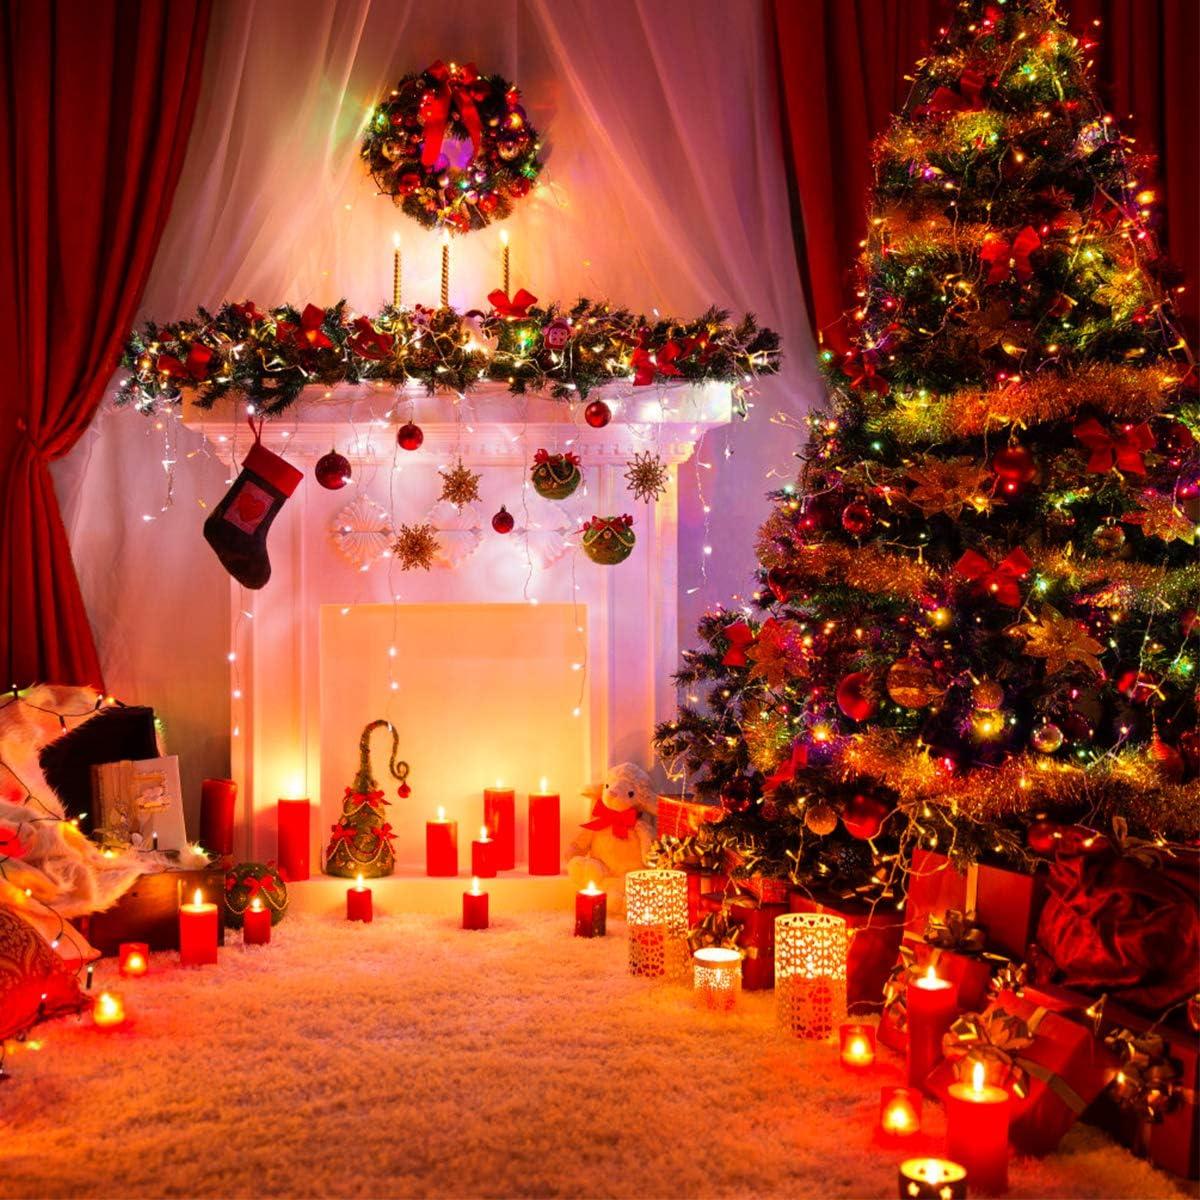 Fodlon 4 Pcs Christmas Decoration Tinsel Shiny Festive Tinsel for Christmas Tree Wedding Birthday Party Decorations Gold Metallic Christmas Tree Tinsel 2M Xmas Tinsel Garland